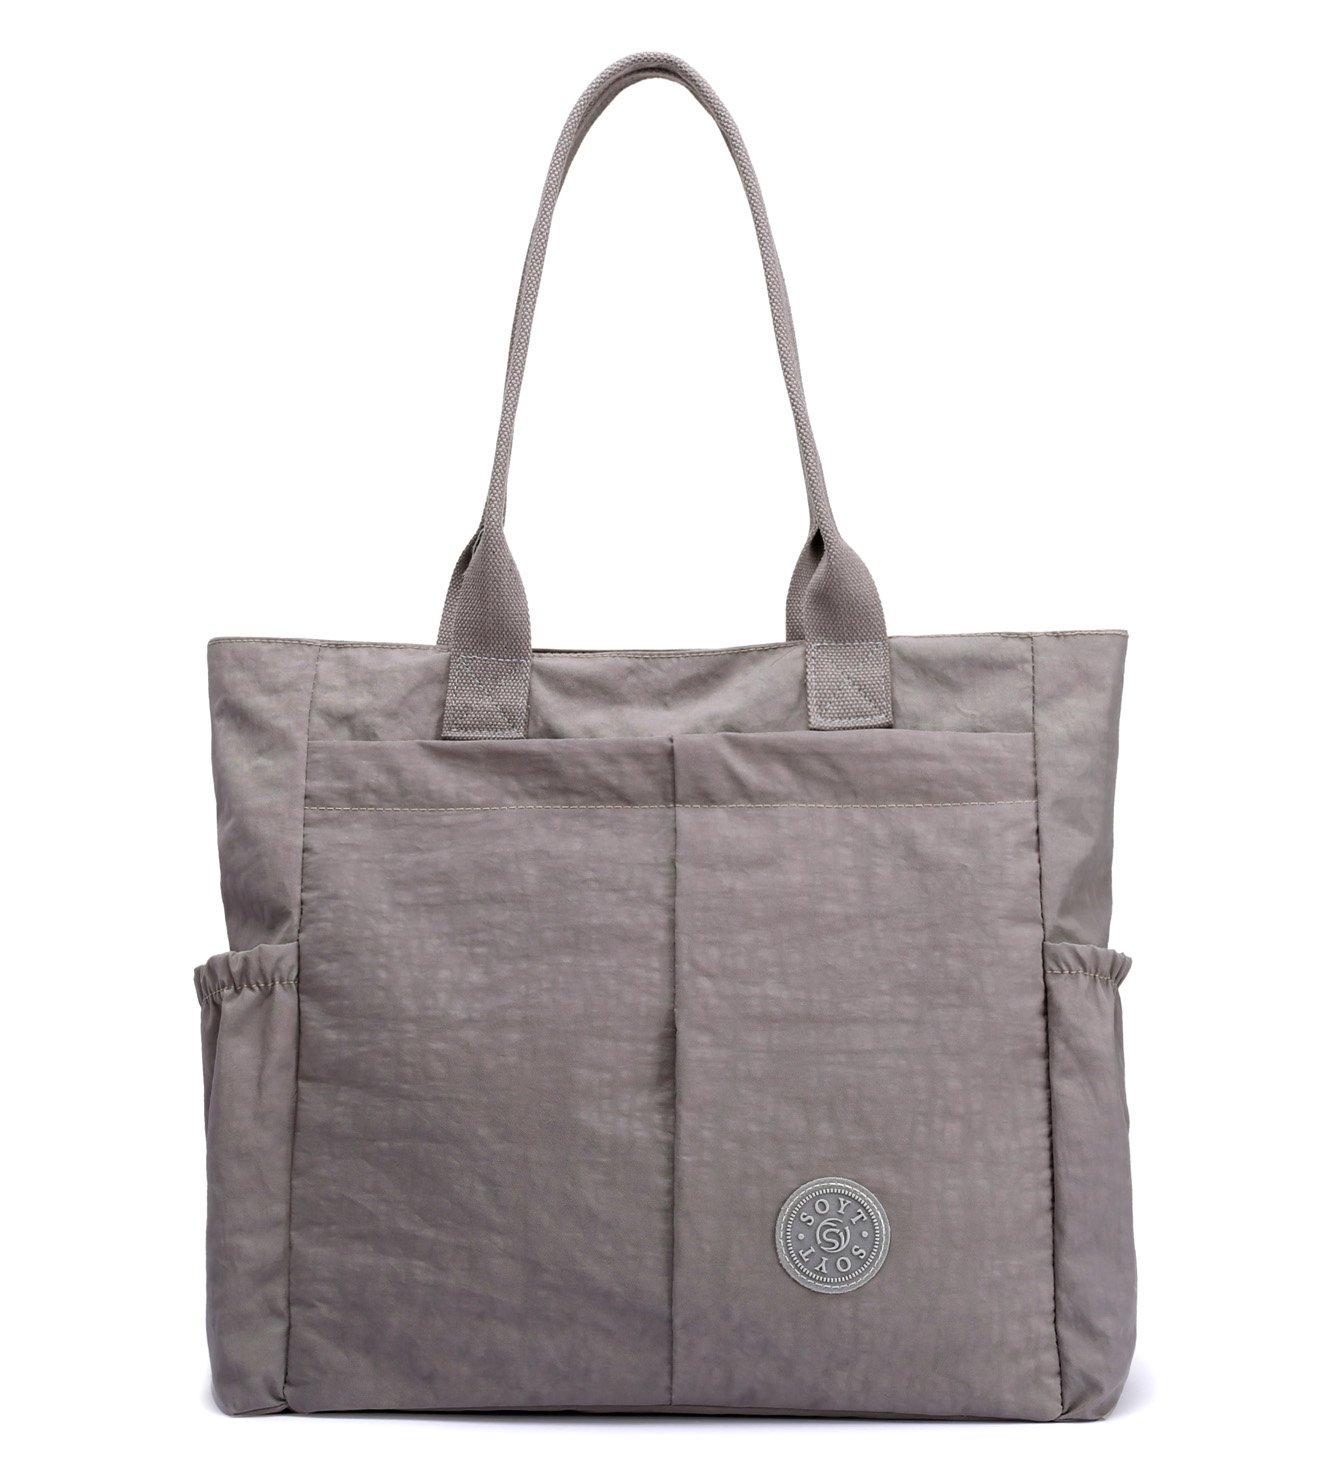 Nylon Water Resistant Multi Pockets Large Lightweight Tote Bag Shoulder Bag Waterproof Handbags (LightGray HB)